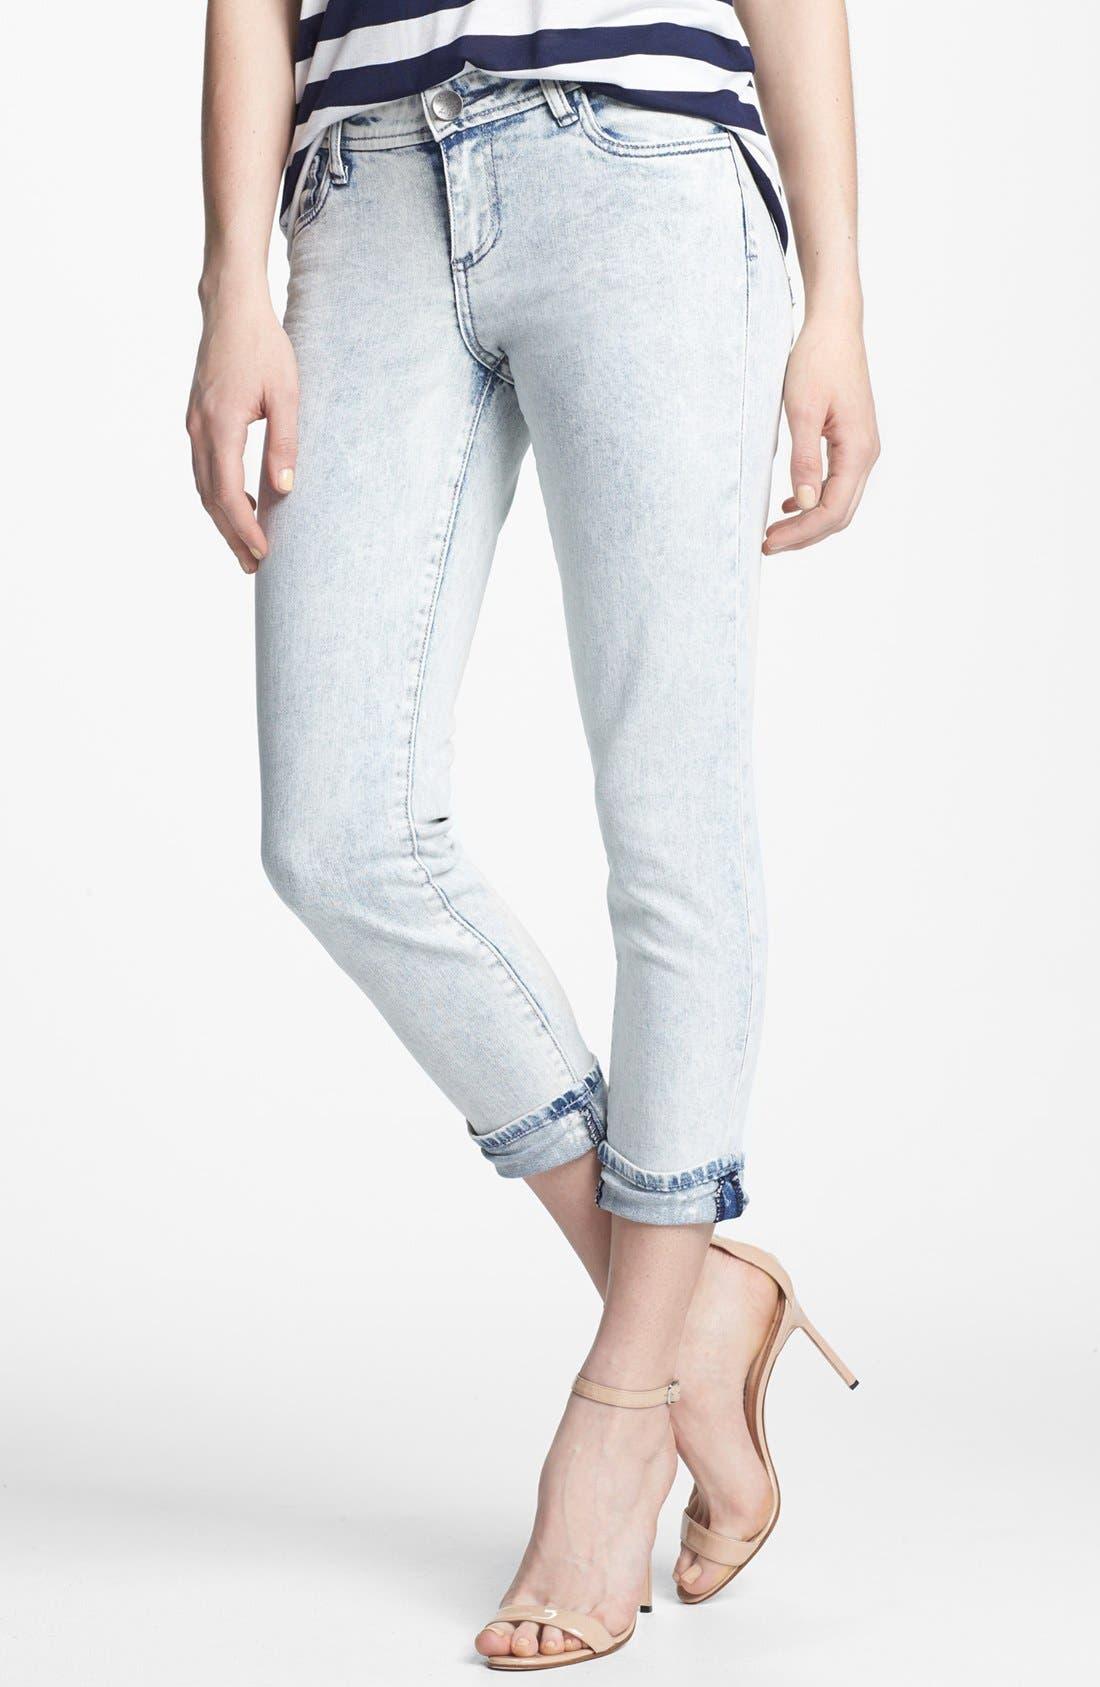 Alternate Image 1 Selected - KUT from the Kloth 'Catherine' Slim Boyfriend Jeans (Seemly)